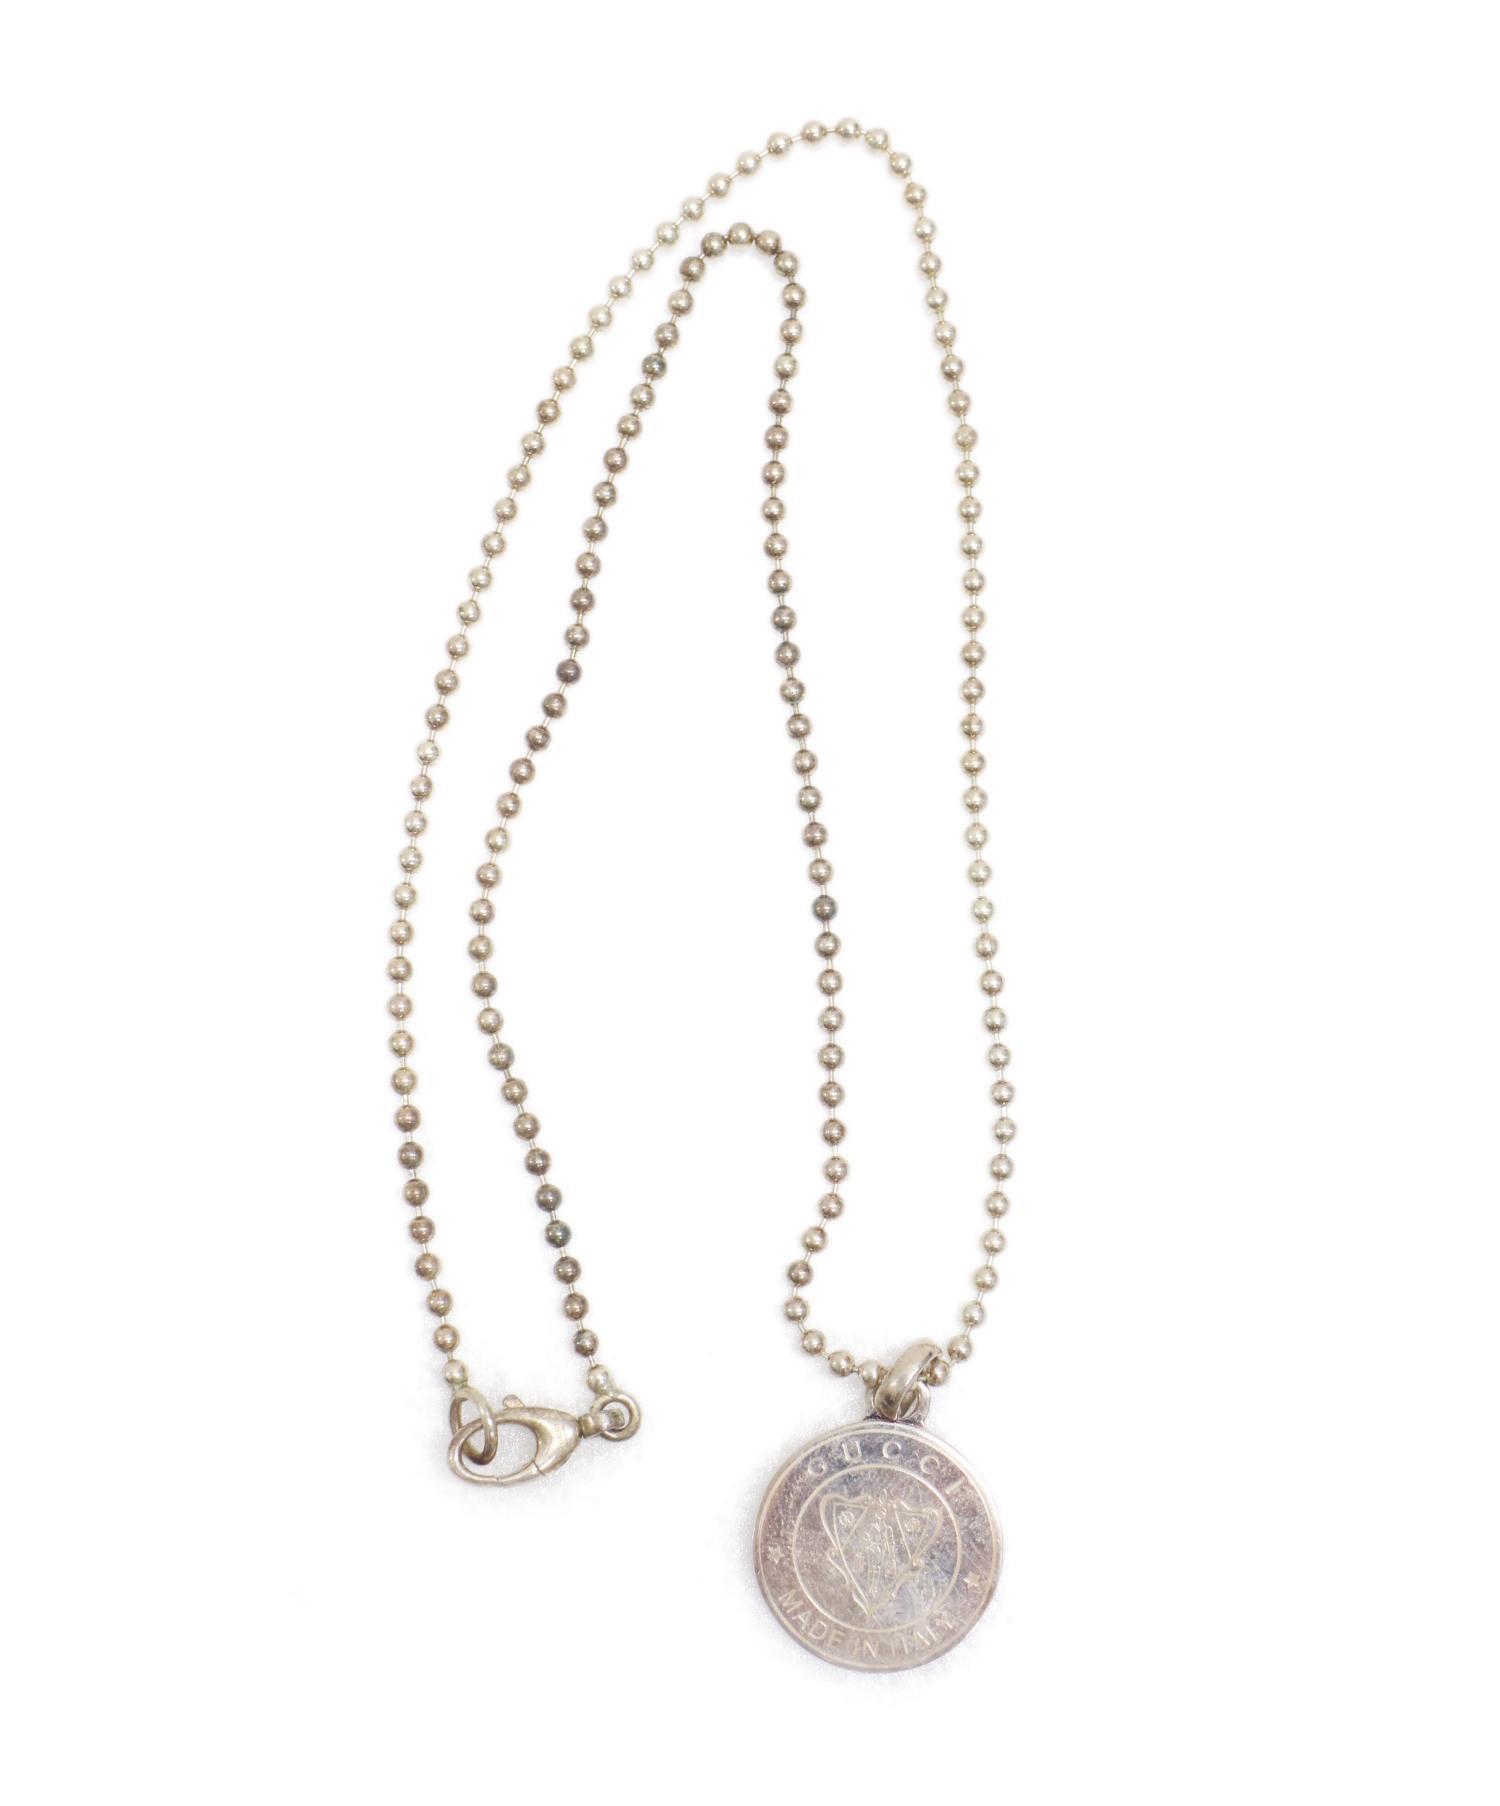 online store 38969 d4c50 [中古]GUCCI(グッチ)のレディース アクセサリー 紋章ネックレス